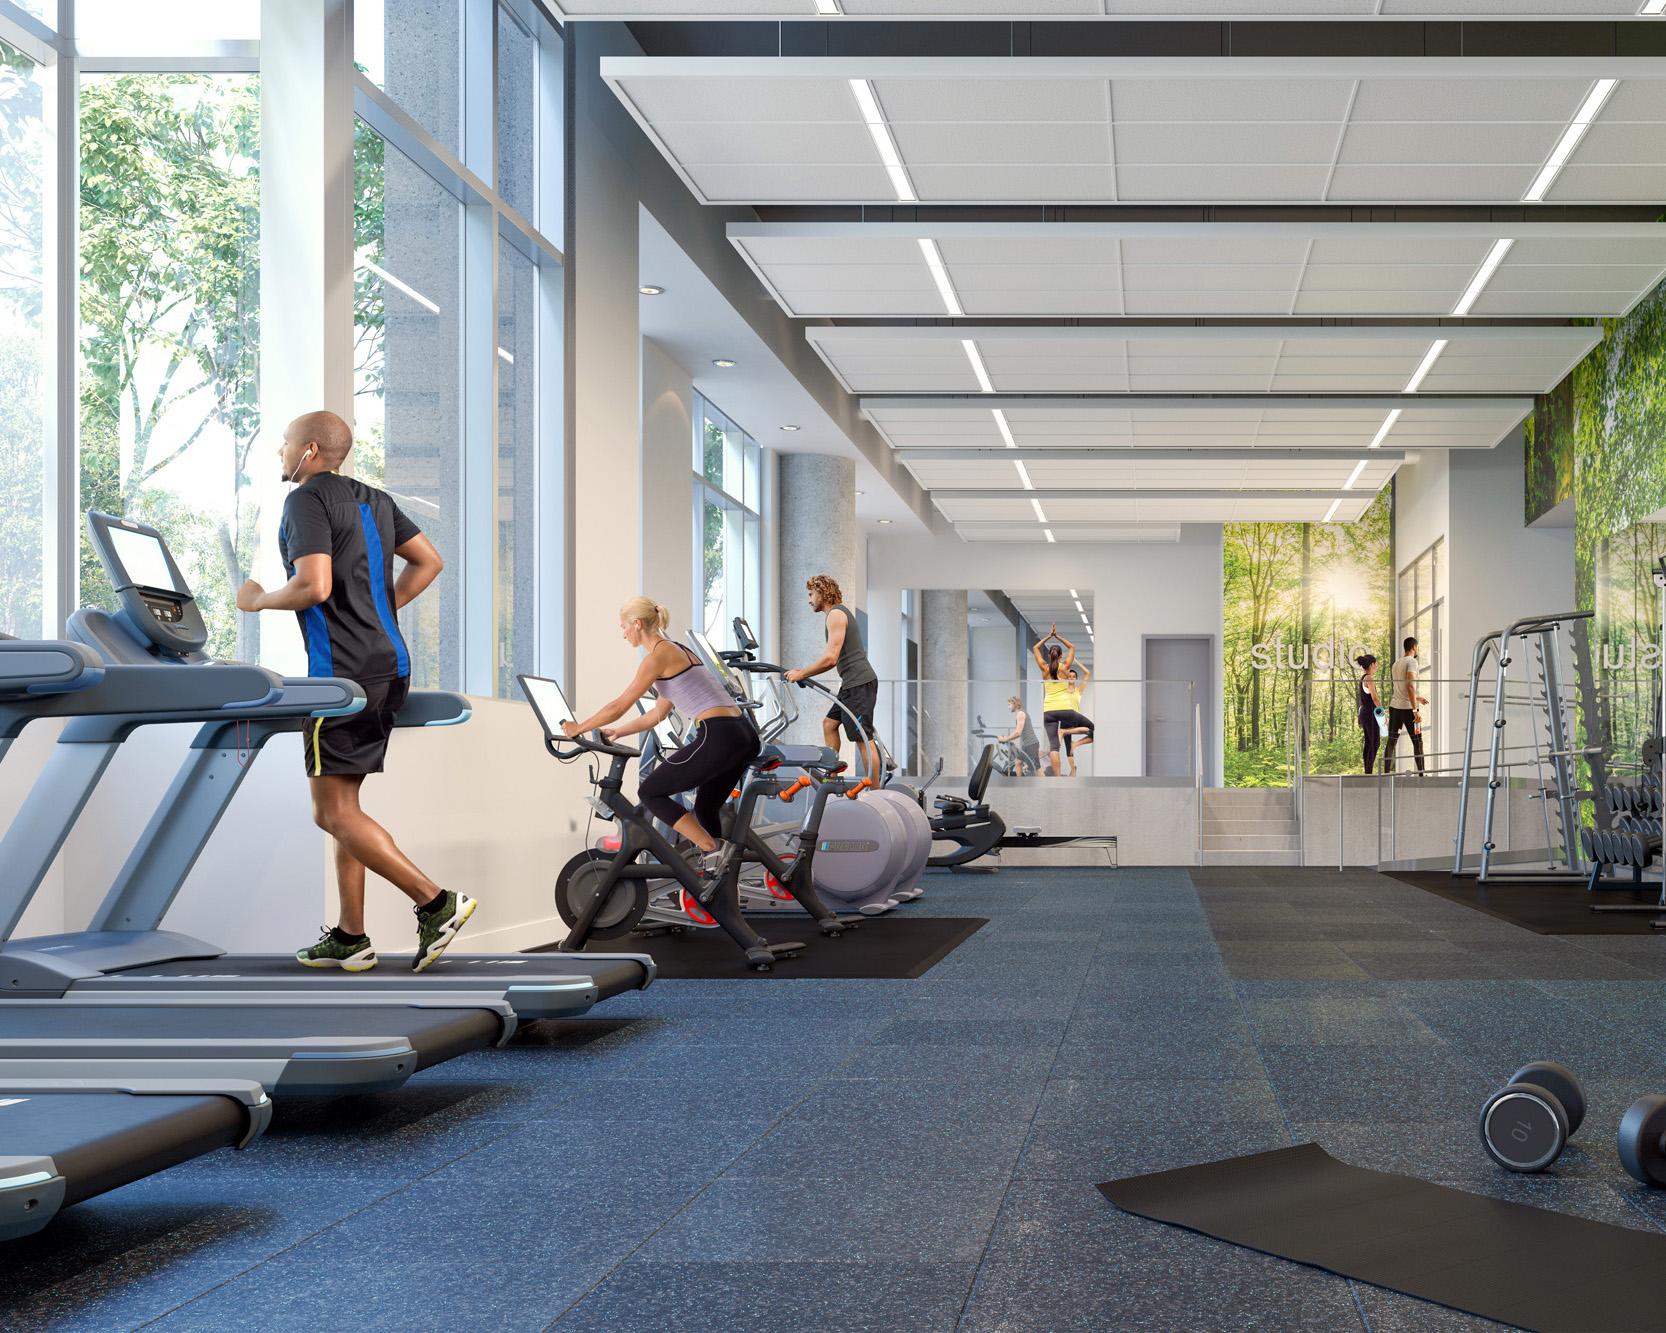 3901 Fairfax Drive Fitness Center